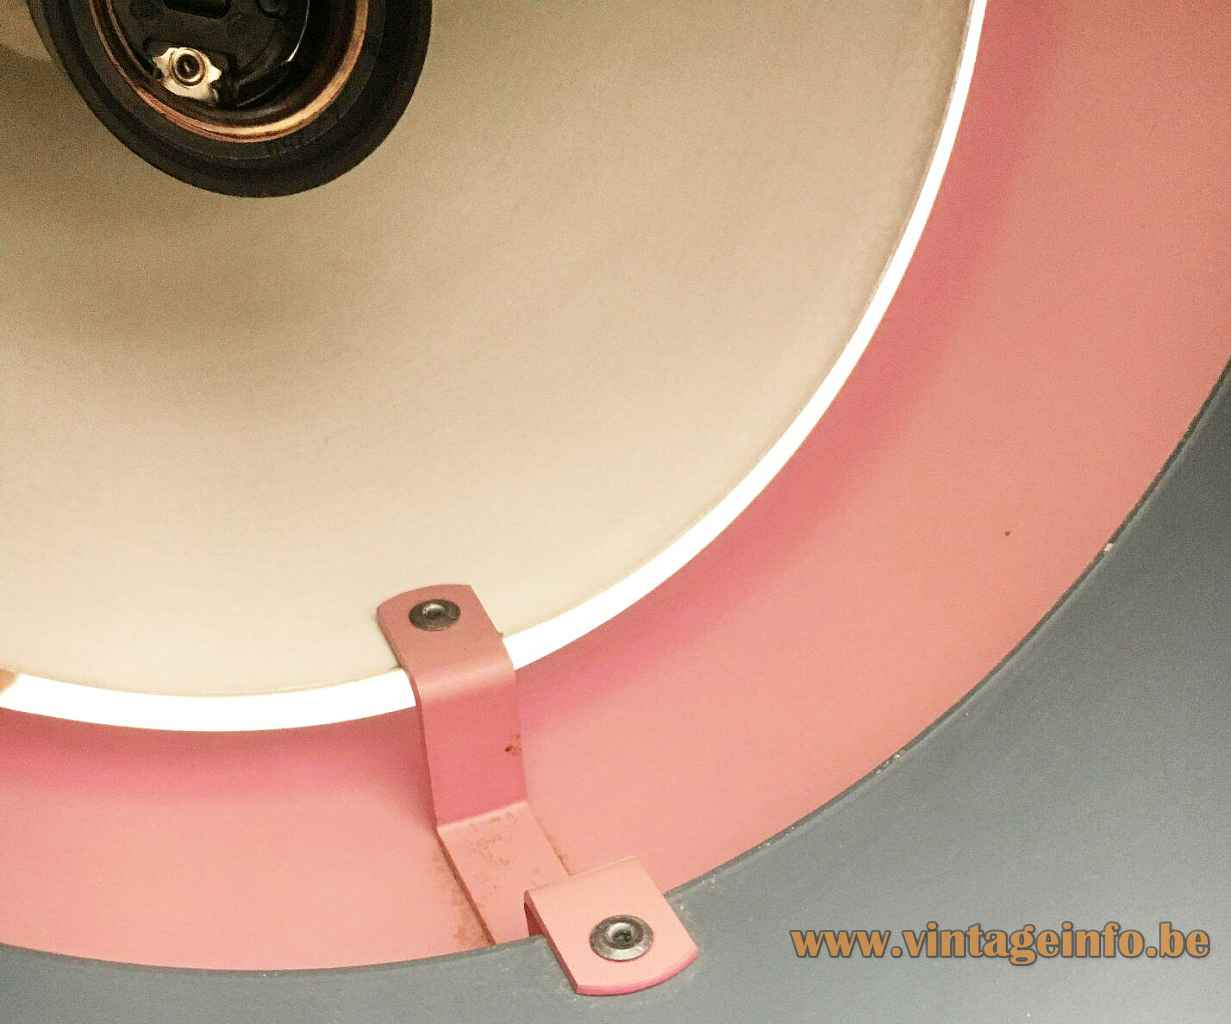 Fog & Mørup Corona pendant lamp conical aluminium lampshade 1960s design: Jo Hammerborg inside view E27 socket